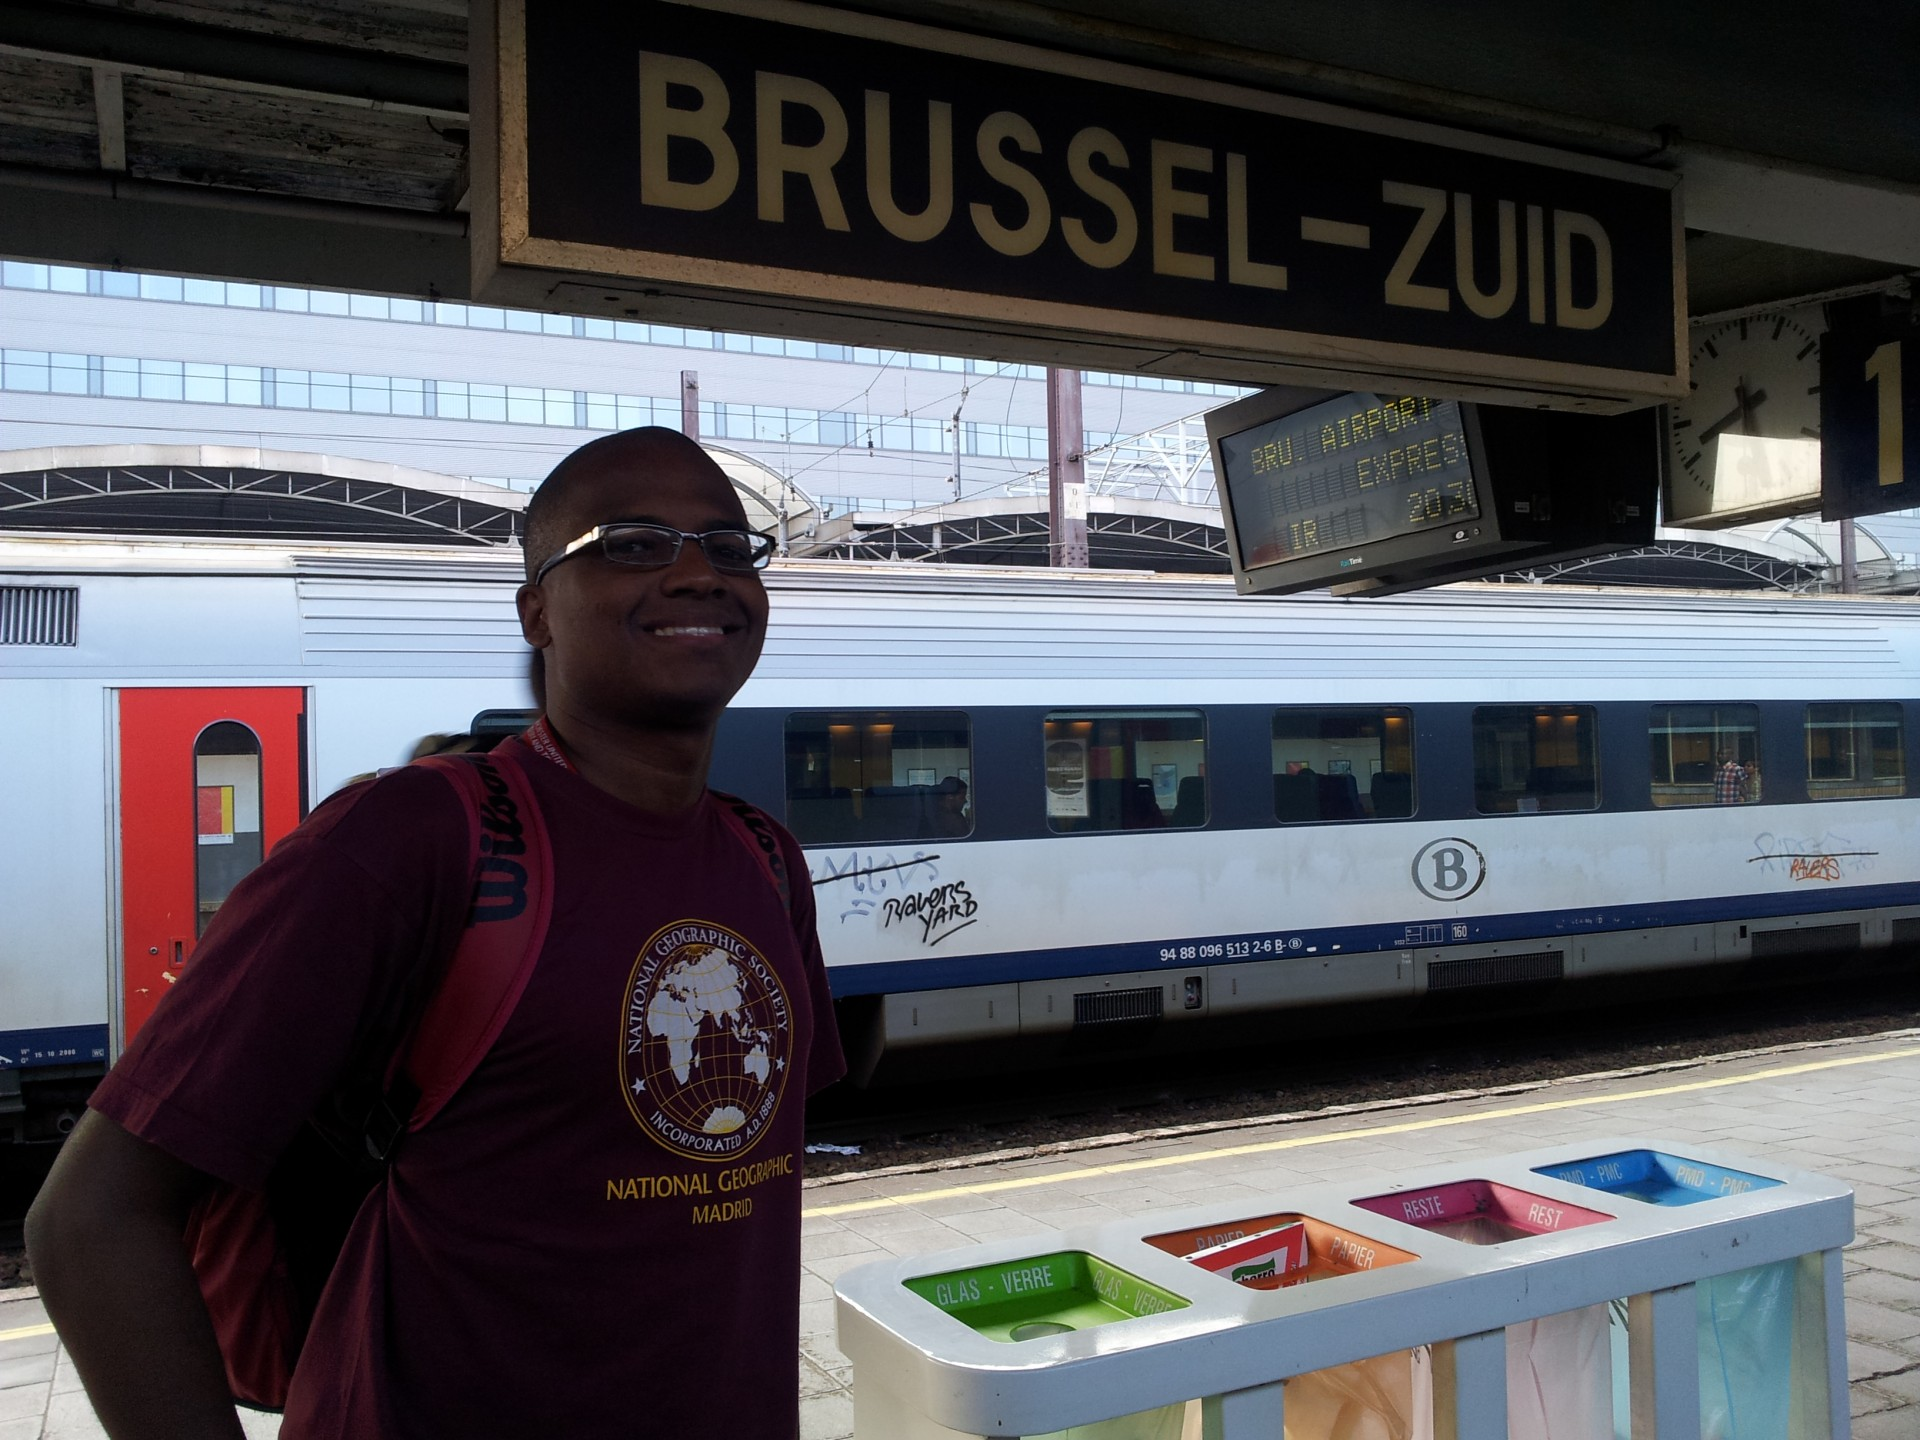 Estação Bruxelles-Midi ou Brussel-Zuid